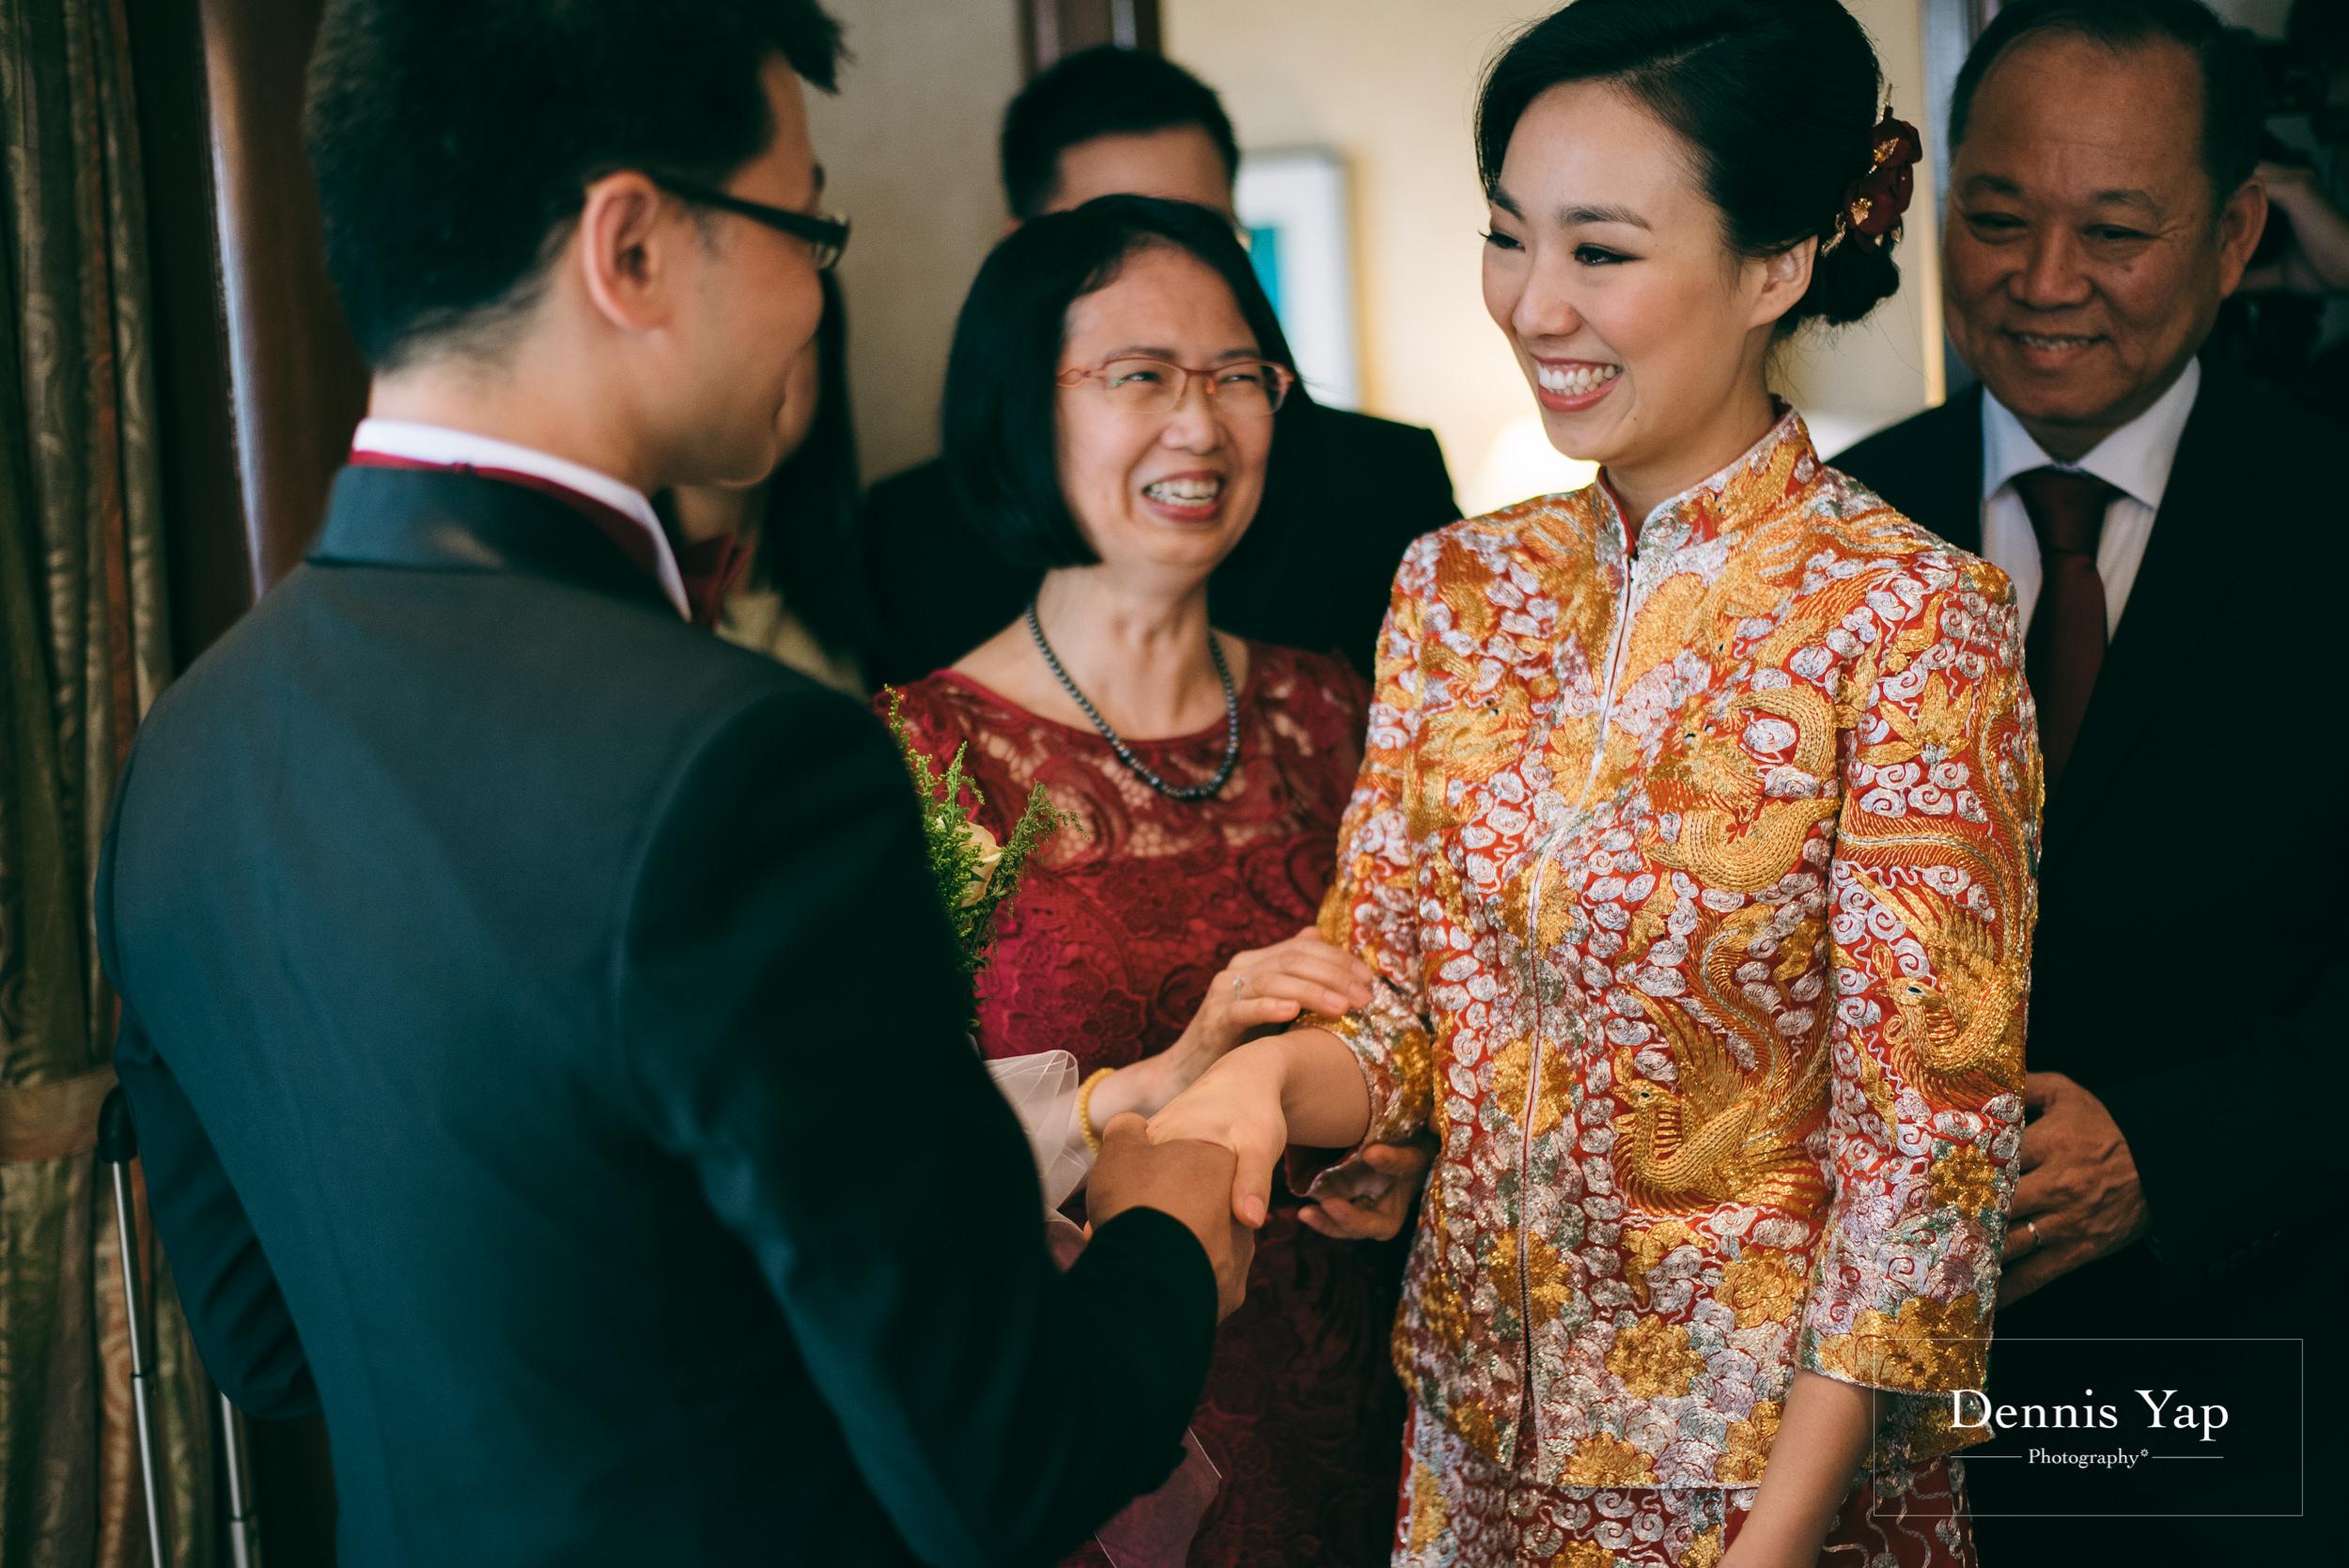 wai keong jenny wedding day bangsar dennis yap photography emotions beloved family-10.jpg